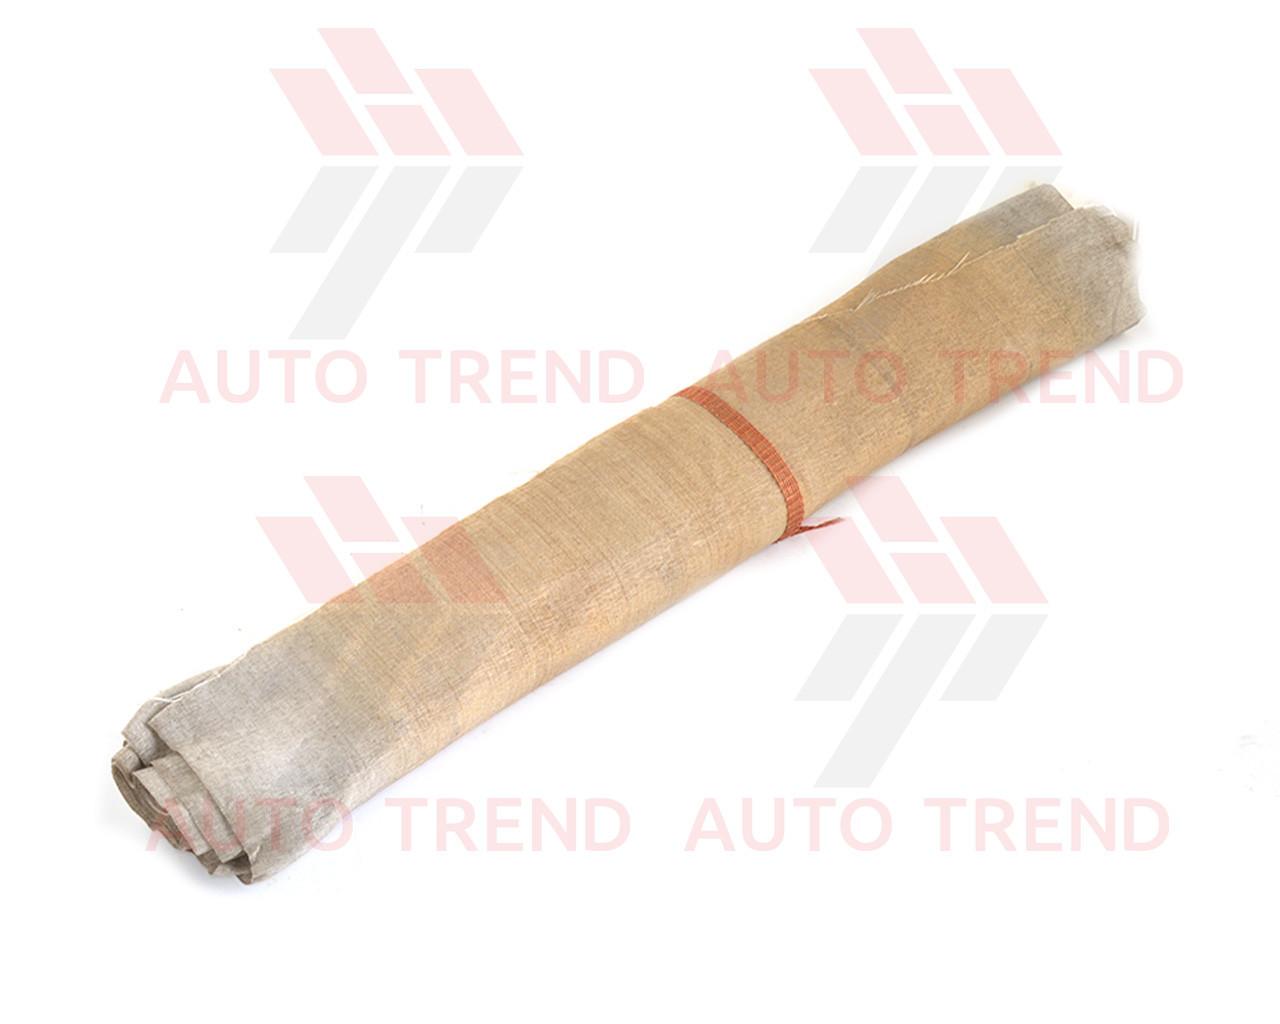 Резина сырая с кордом, сквиджен 1,6х500мм, 2,9кг, Украина